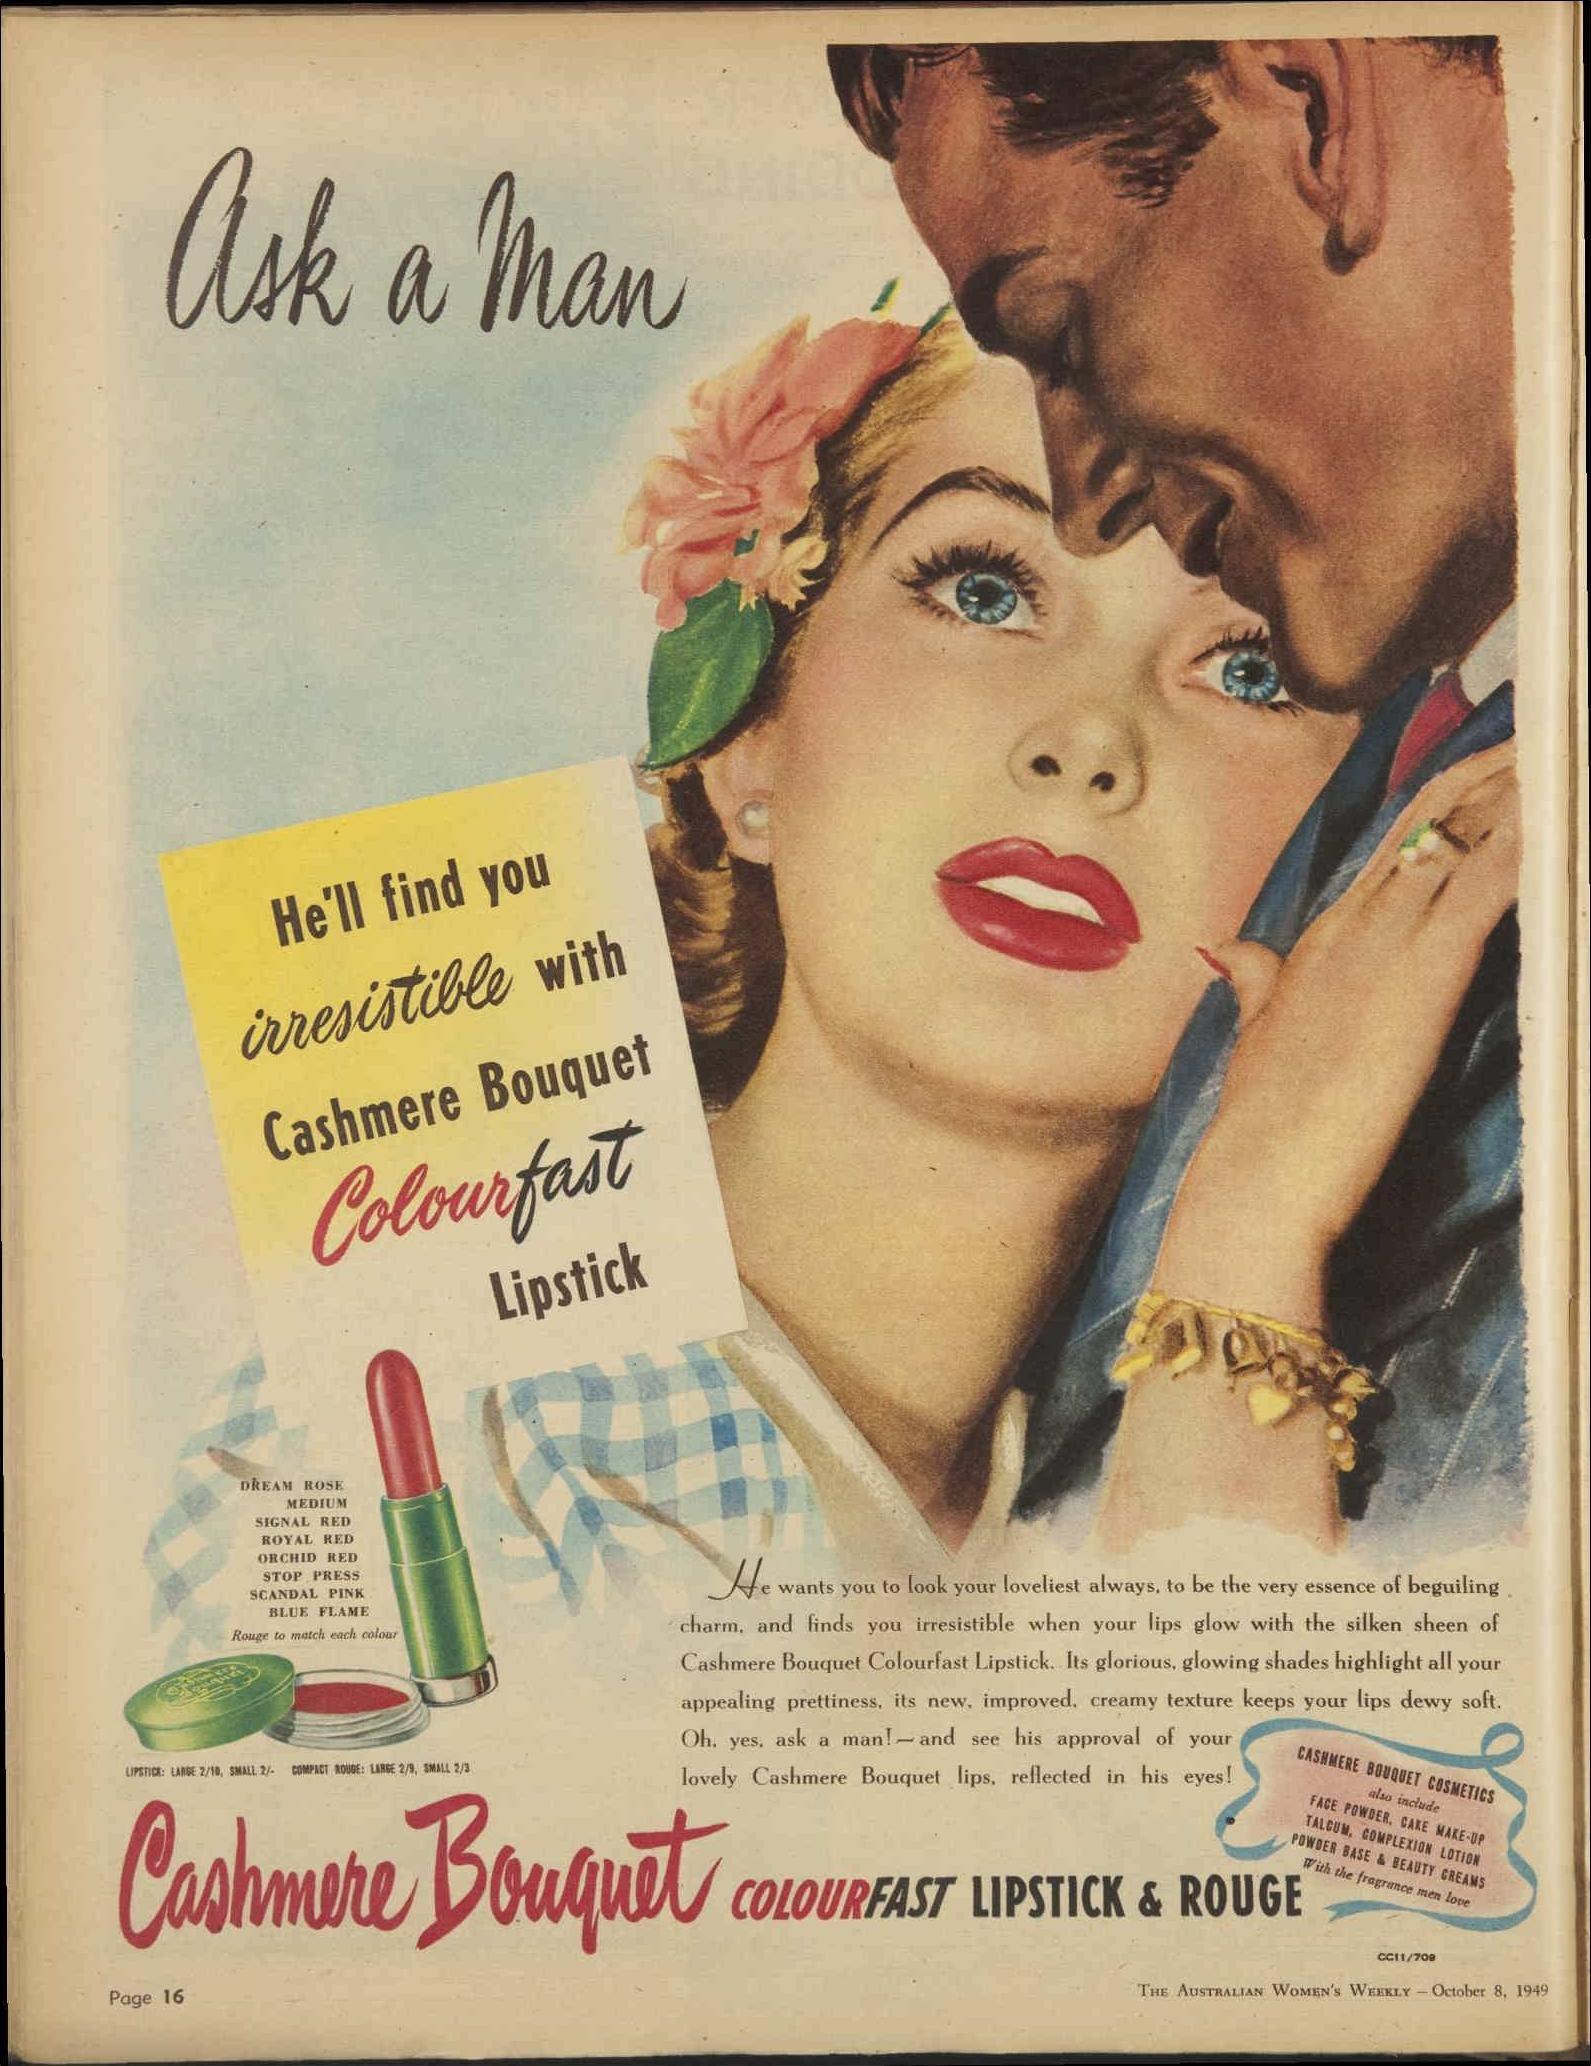 Issue 8 Oct 1949 The Australian Women S Week Vintage Advertisements Retro Advertising Australian Vintage